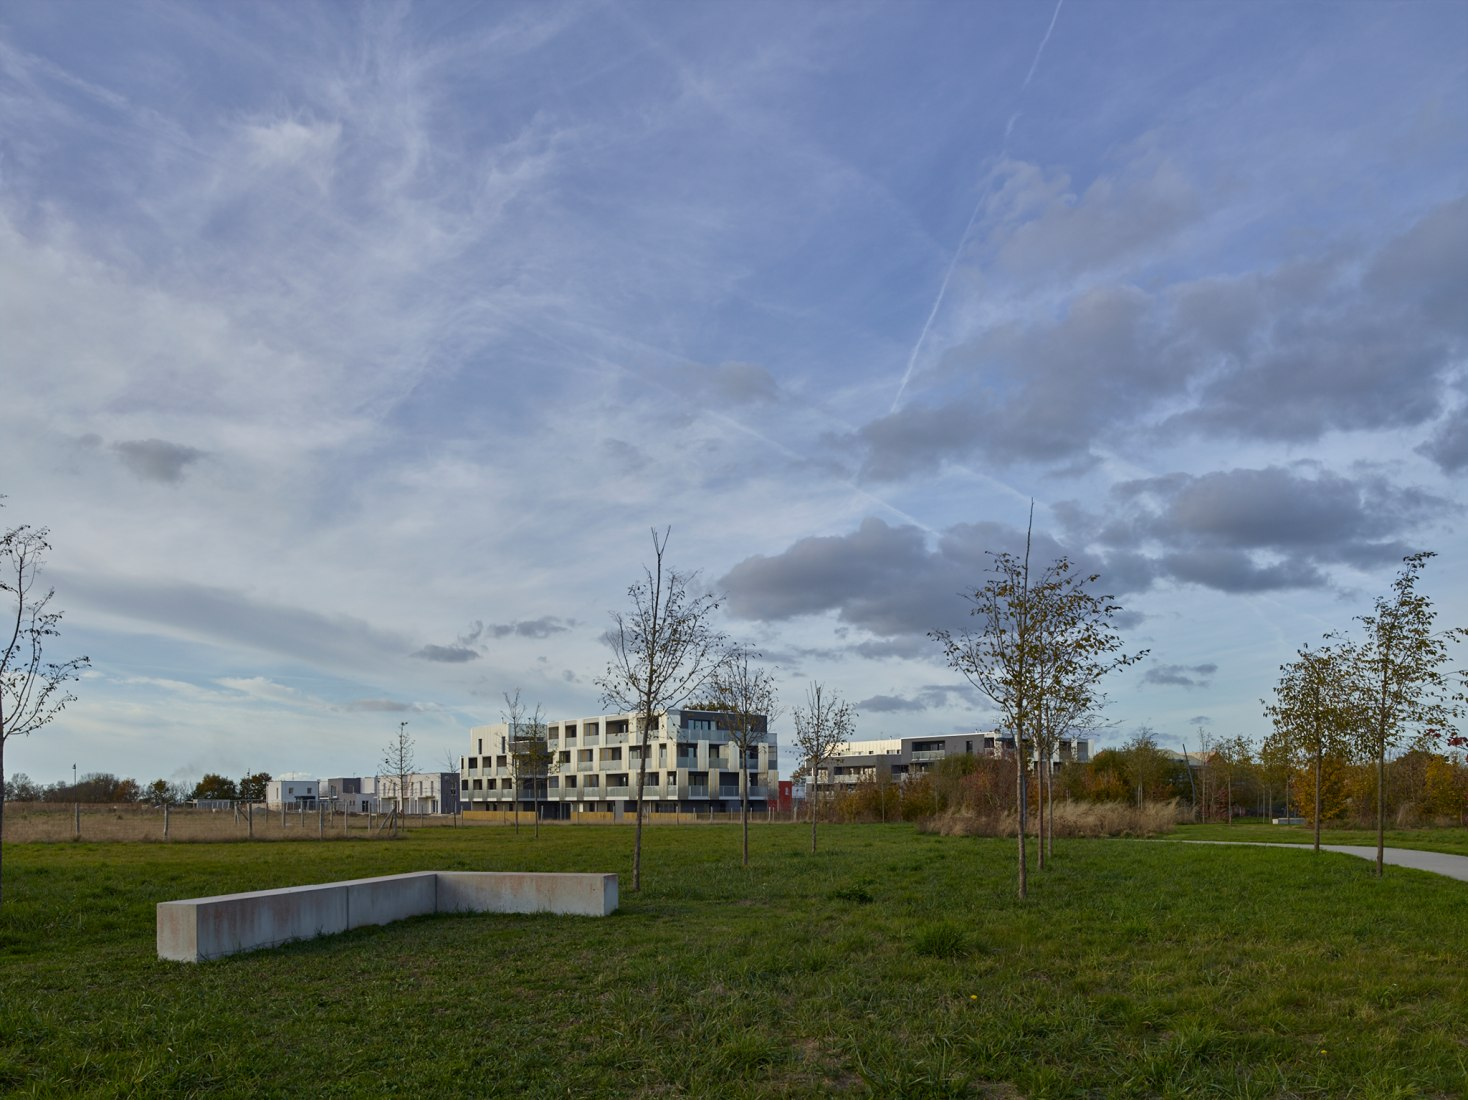 45 viviendas en ZAC West Downtown en Couëron por A/LTA. Fotografía © S. Chalmeau.